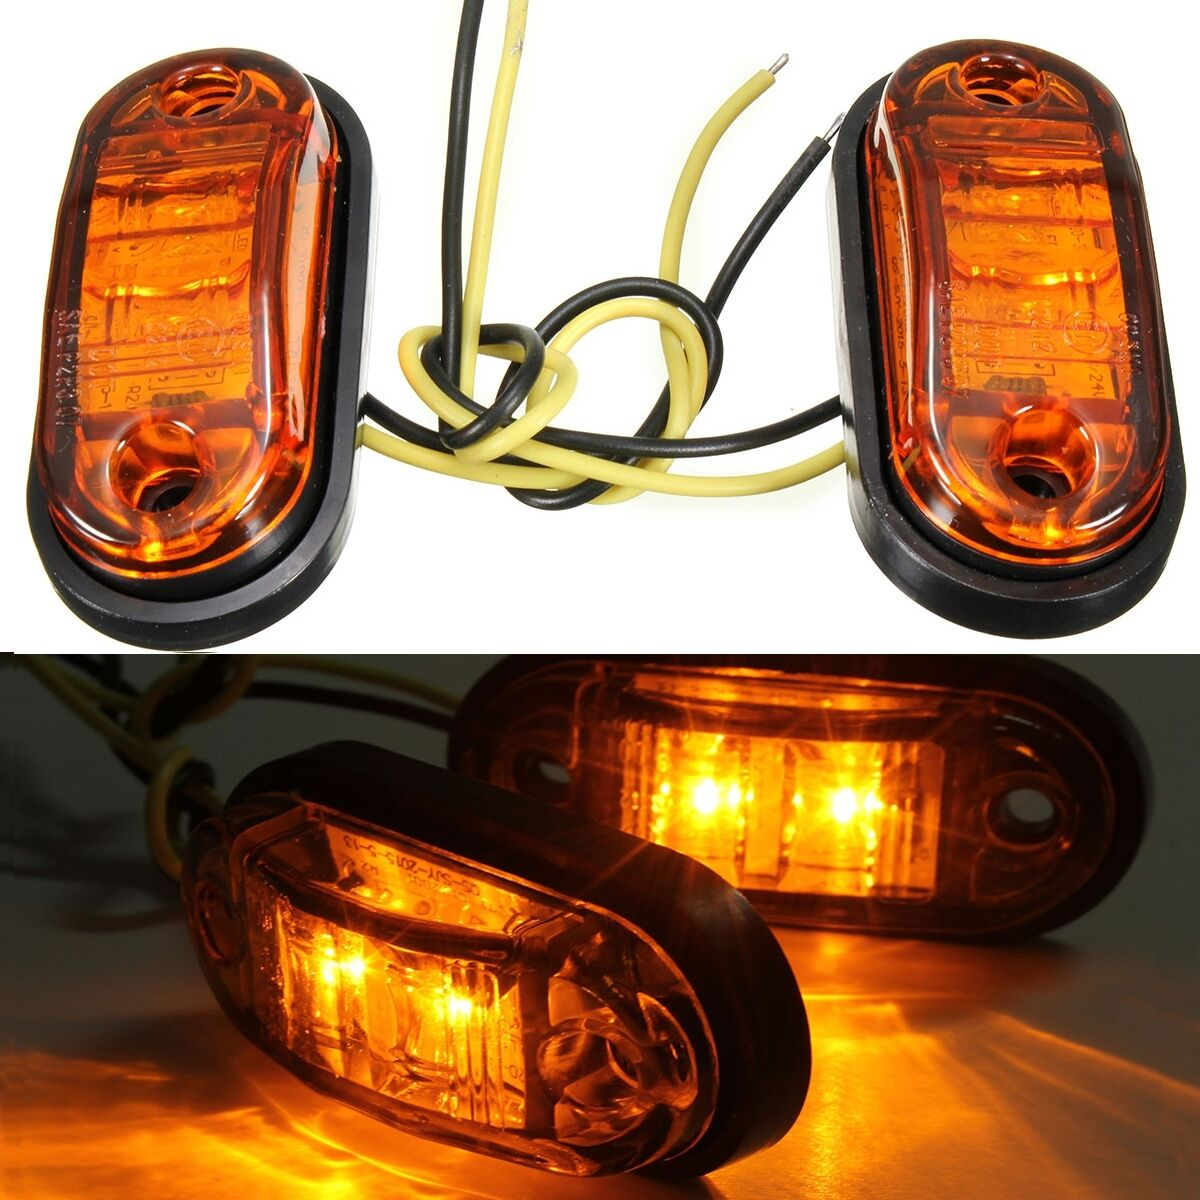 2x Car Truck Trailer 2LED 12V/24V Side Marker Amber Indicators Turn Signal Light